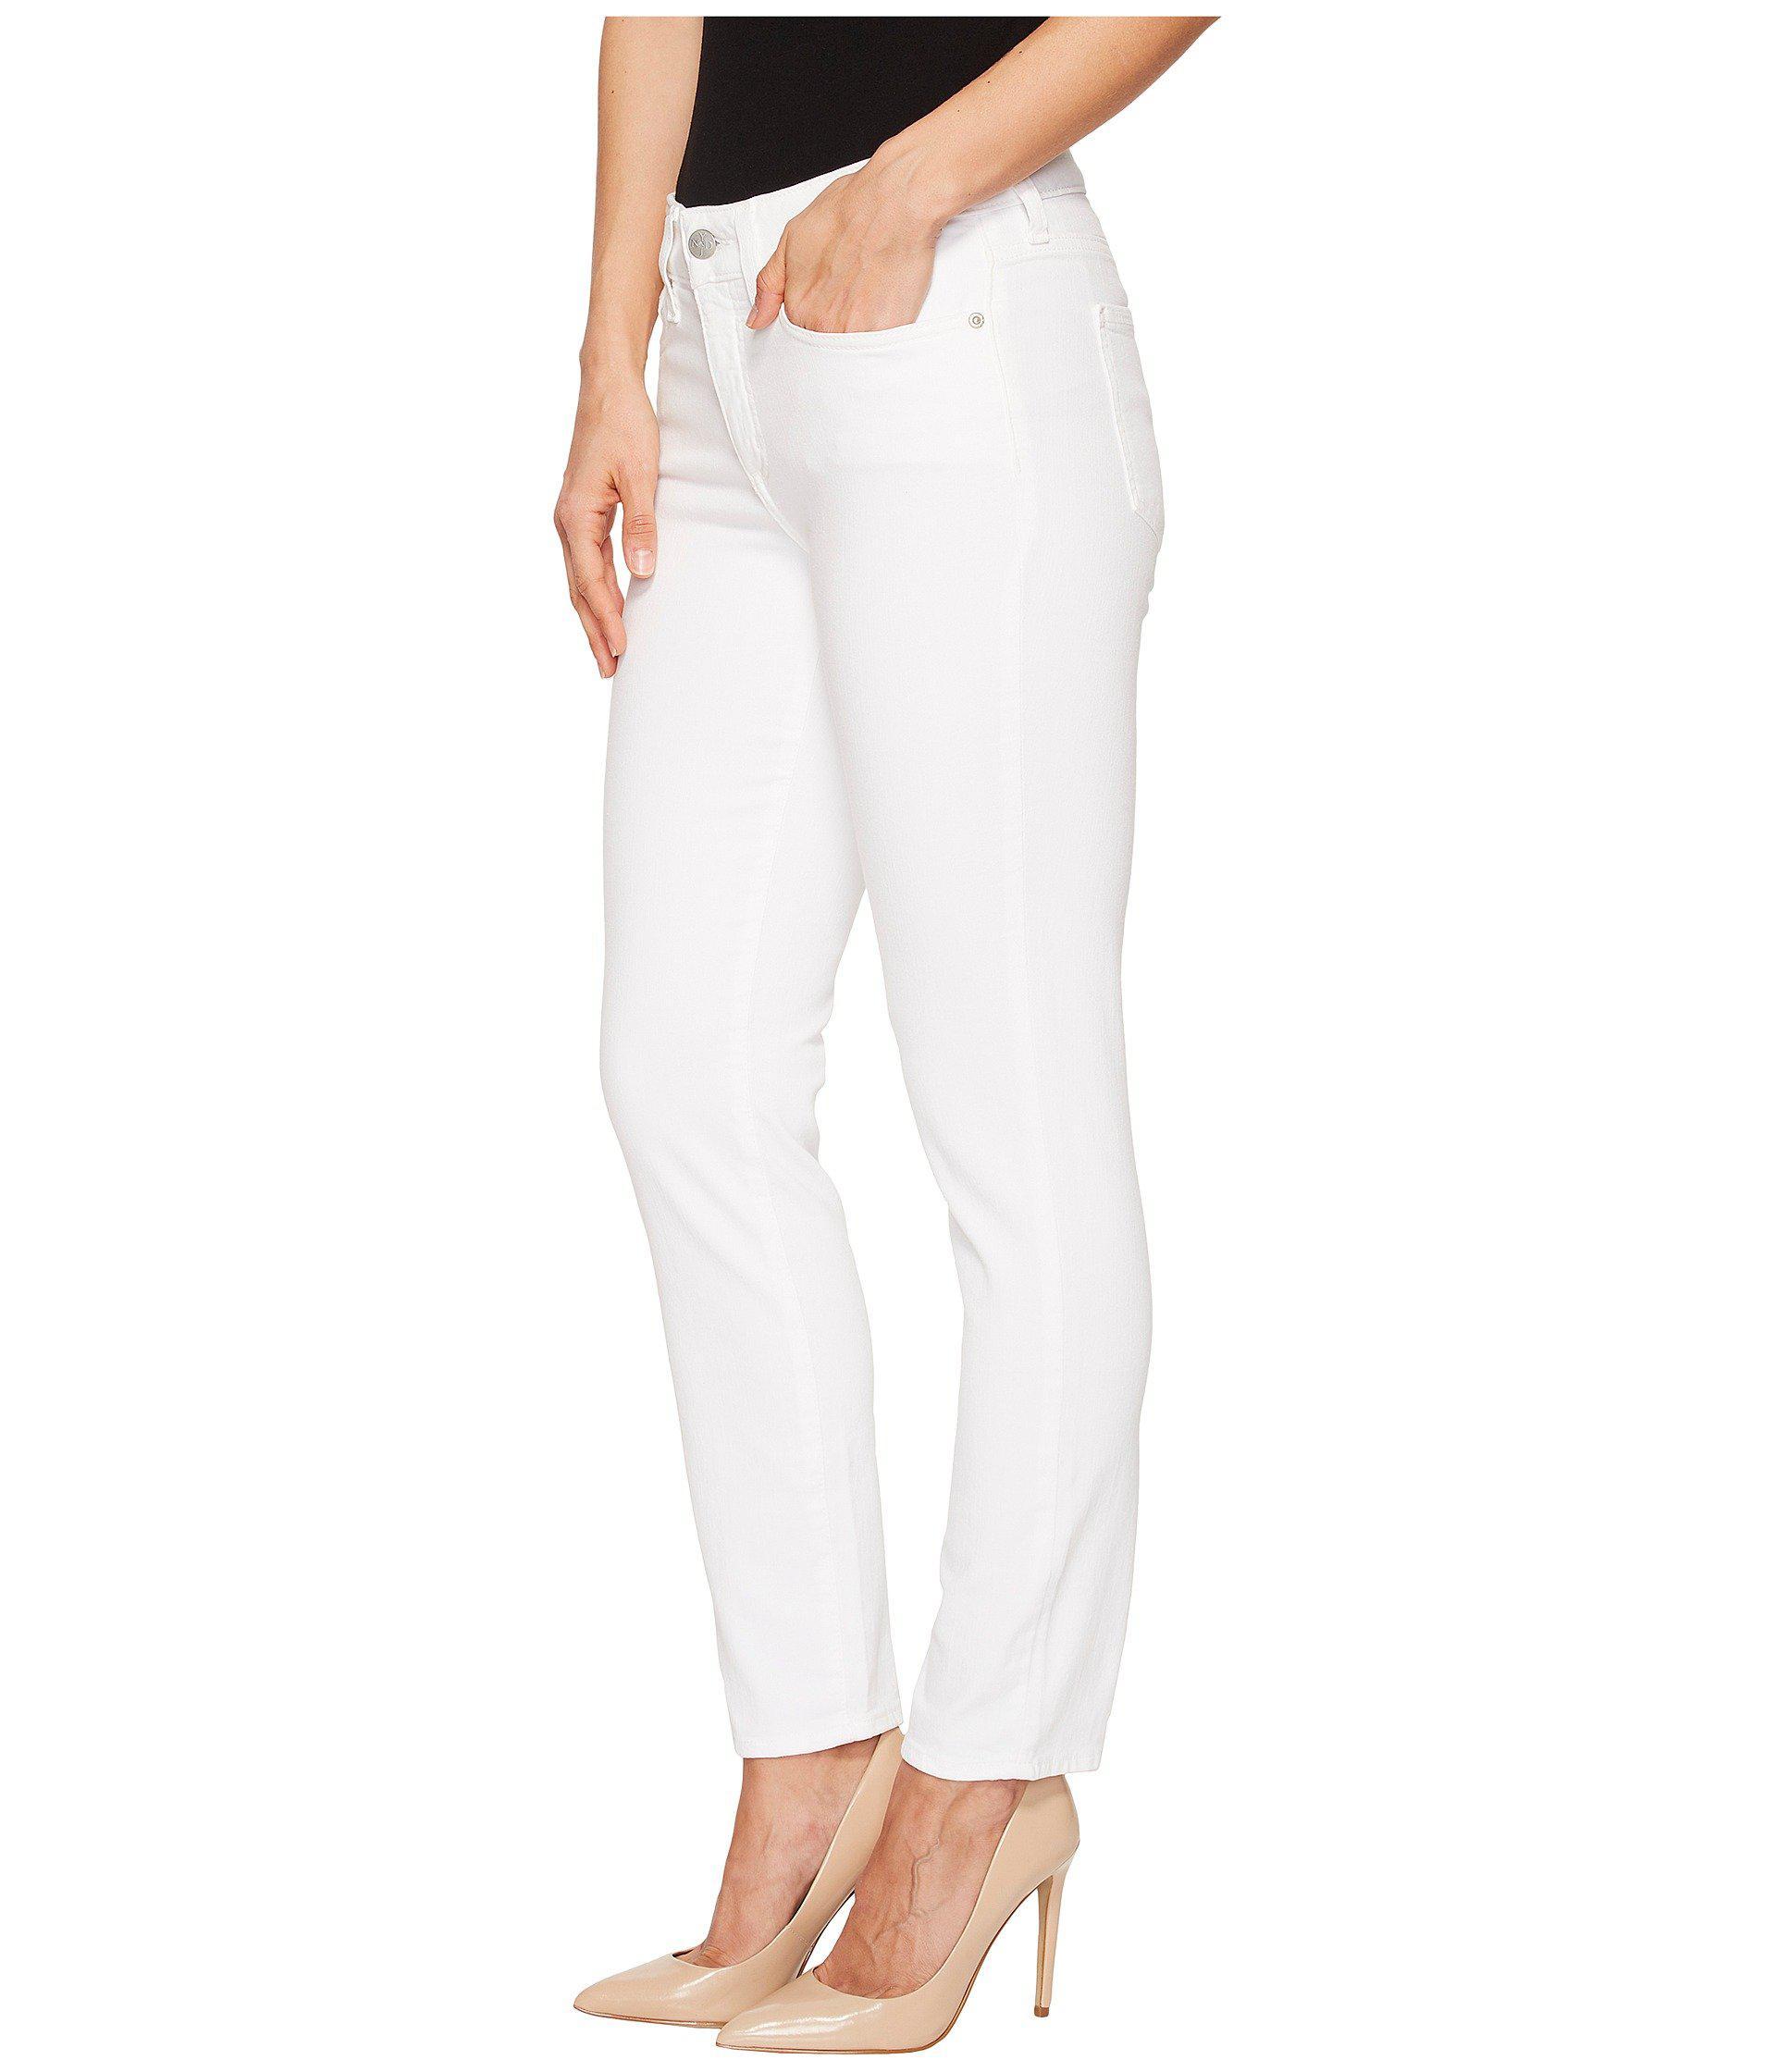 8f1eb3a98e1b3 Lyst - NYDJ Alina Ankle W/ Clean Hem In Optic White in White